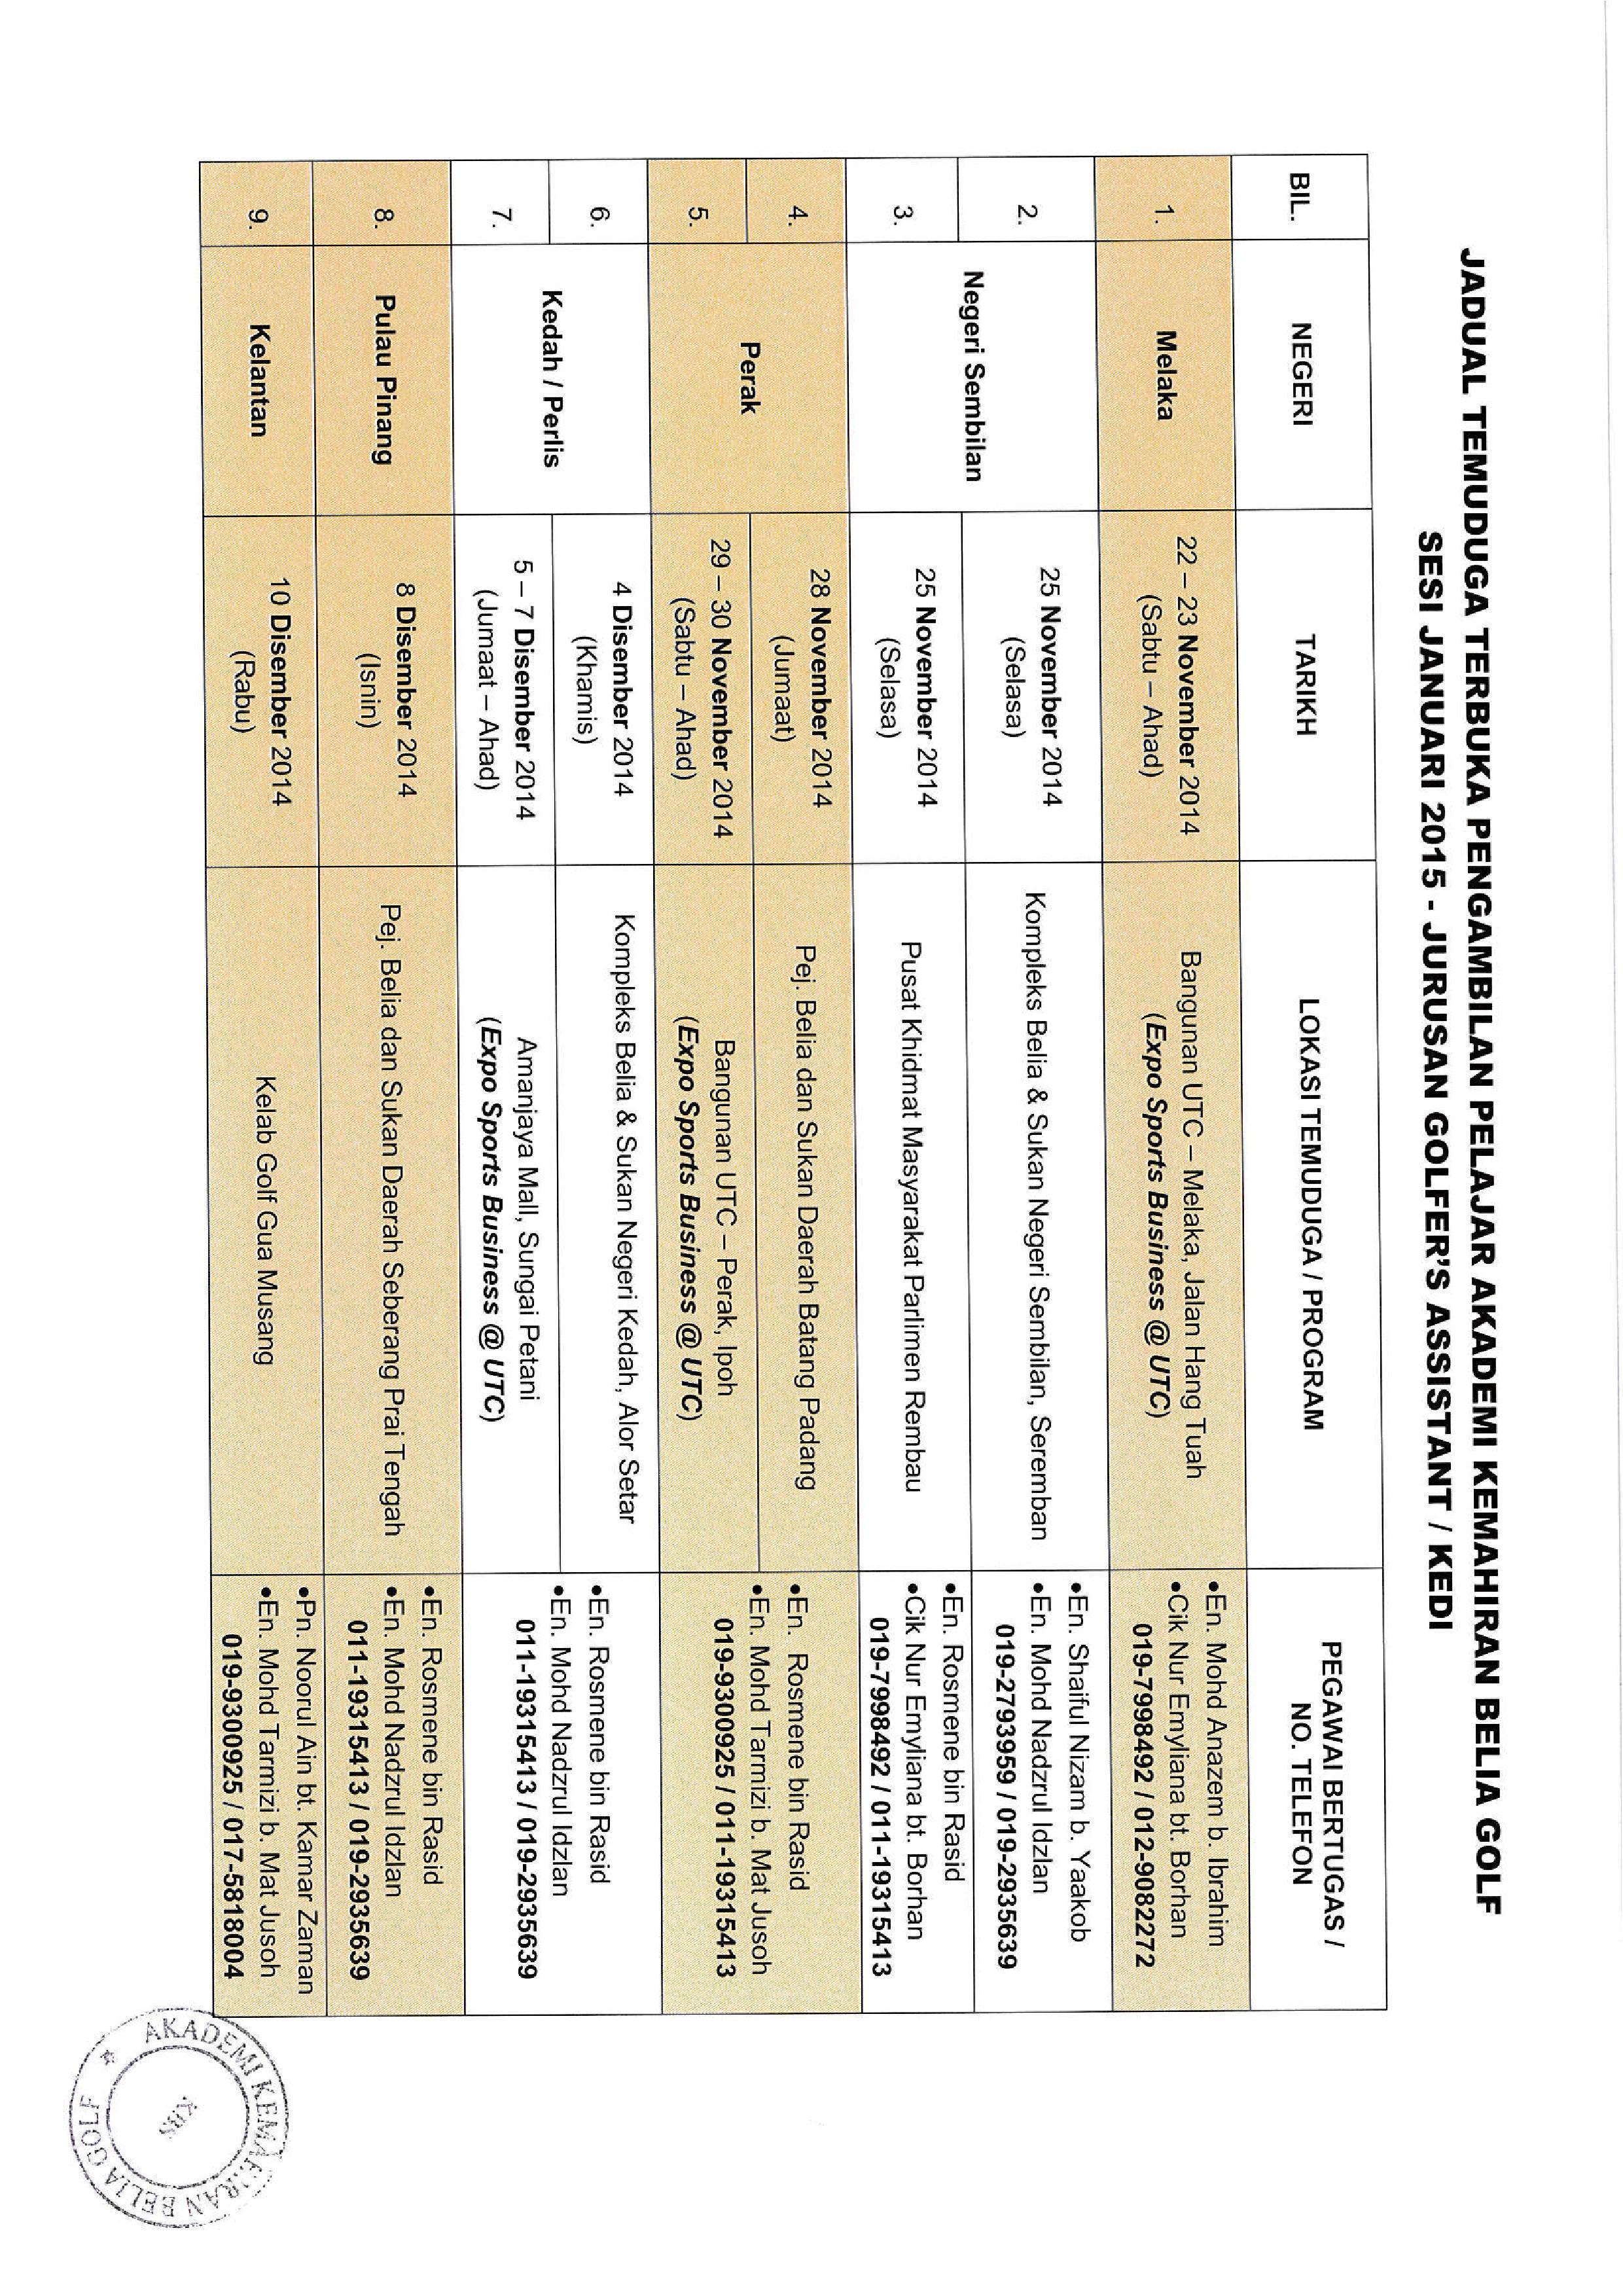 1.Jadual Temuduga Terbuka Pengambilan Pelajar AKBG Sesi Januari 2015